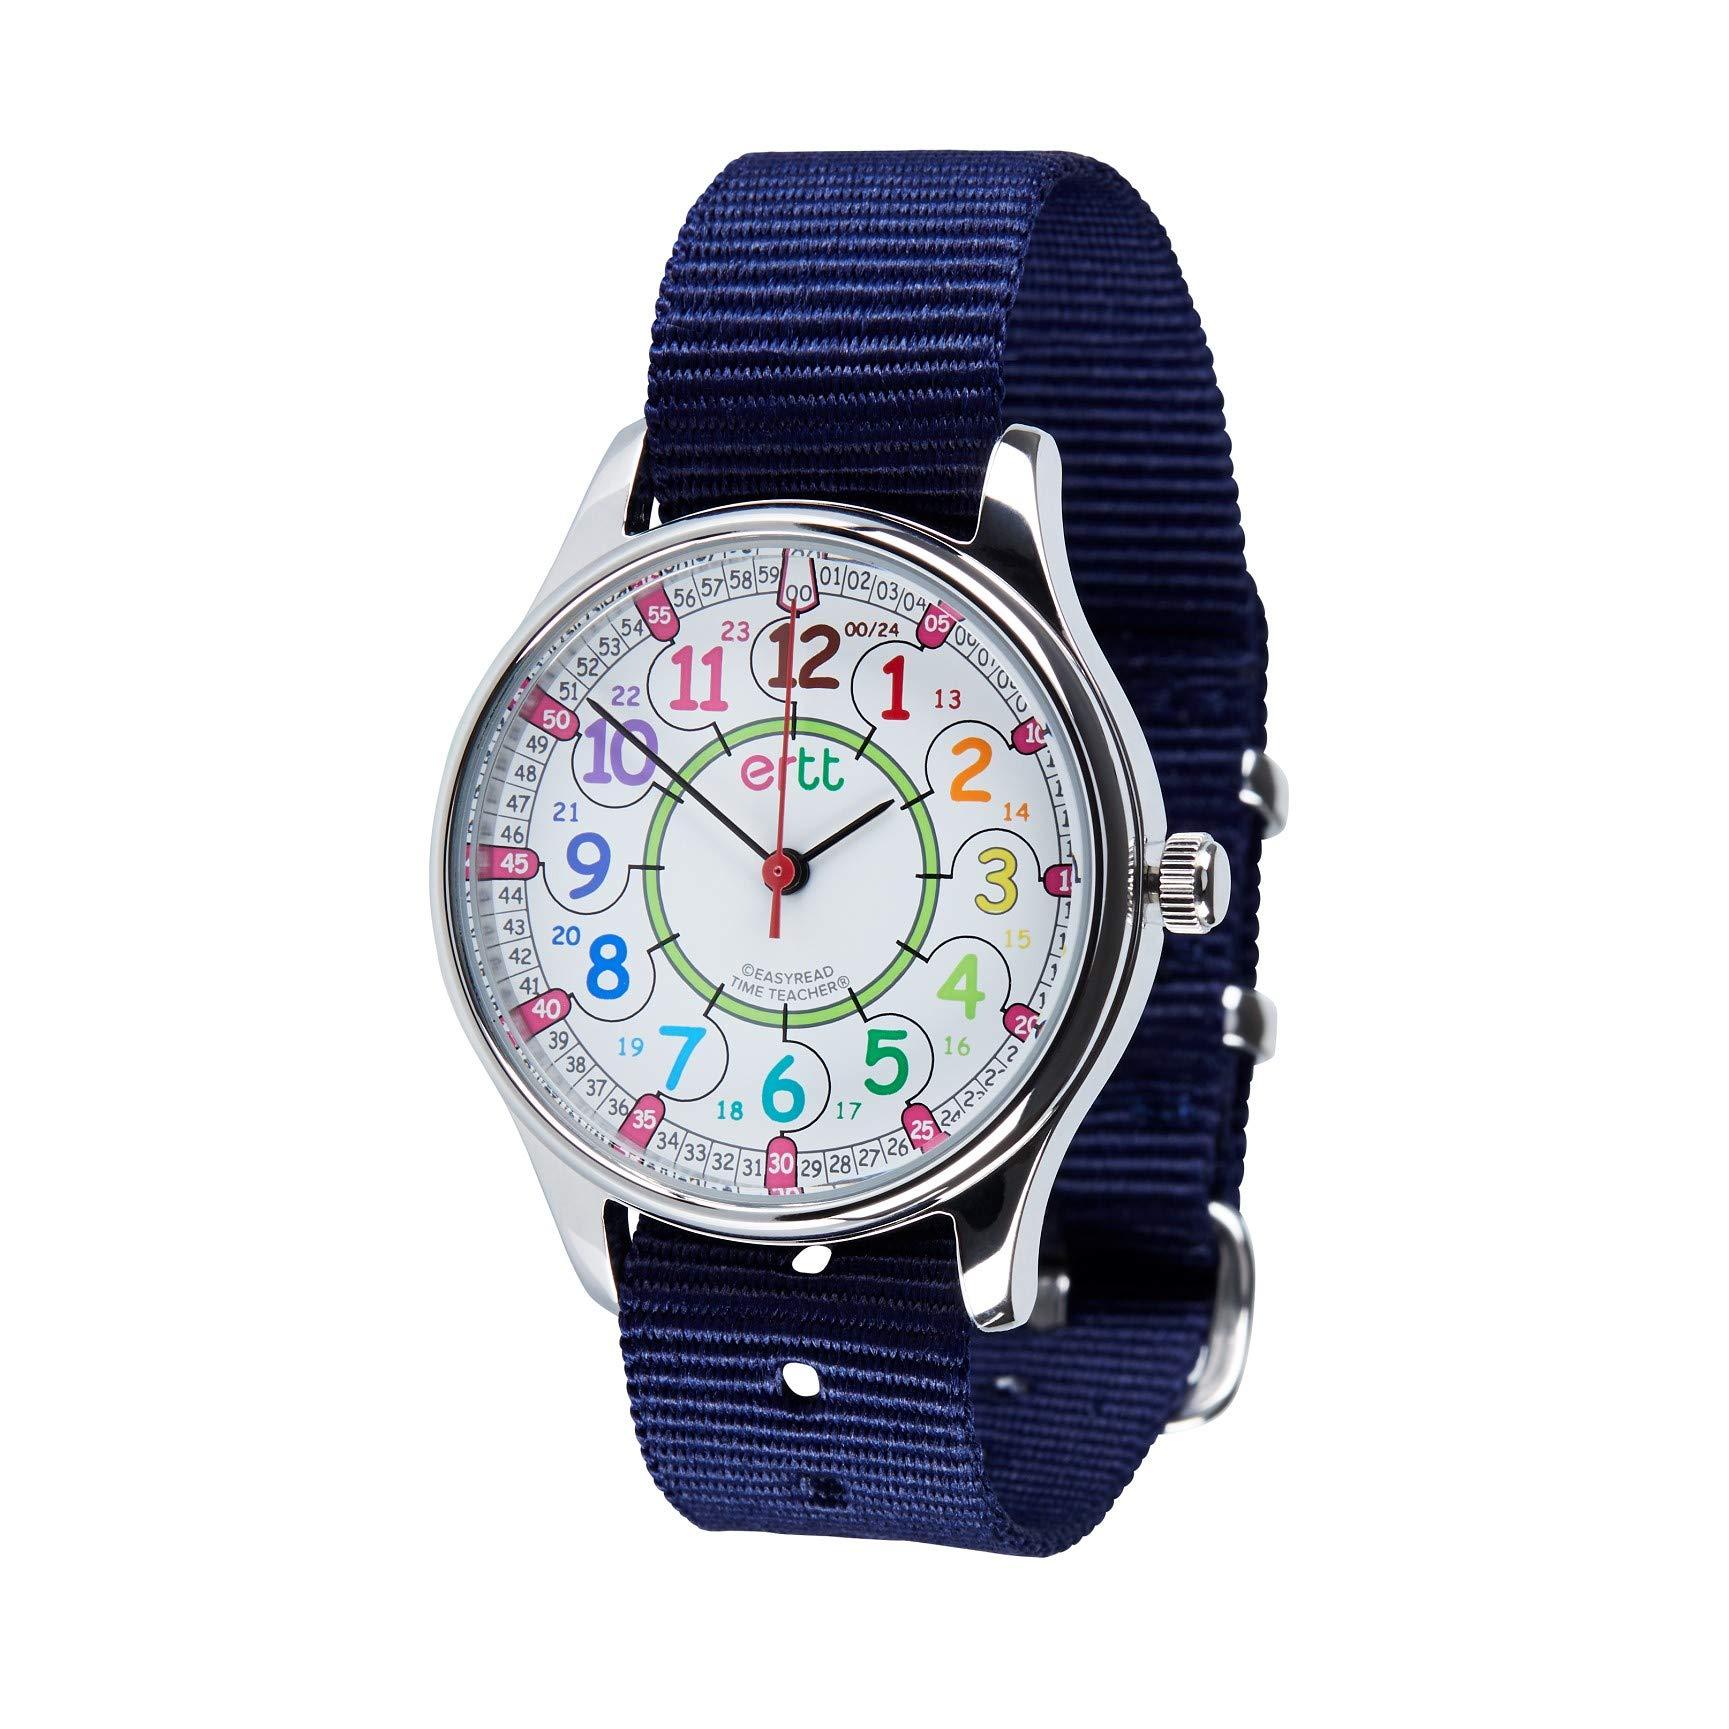 EasyRead Time Teacher WERW-COL-24-NB Rainbow Face 12/24 Hour Waterproof Watch, Navy Blue Strap by EasyRead Time Teacher